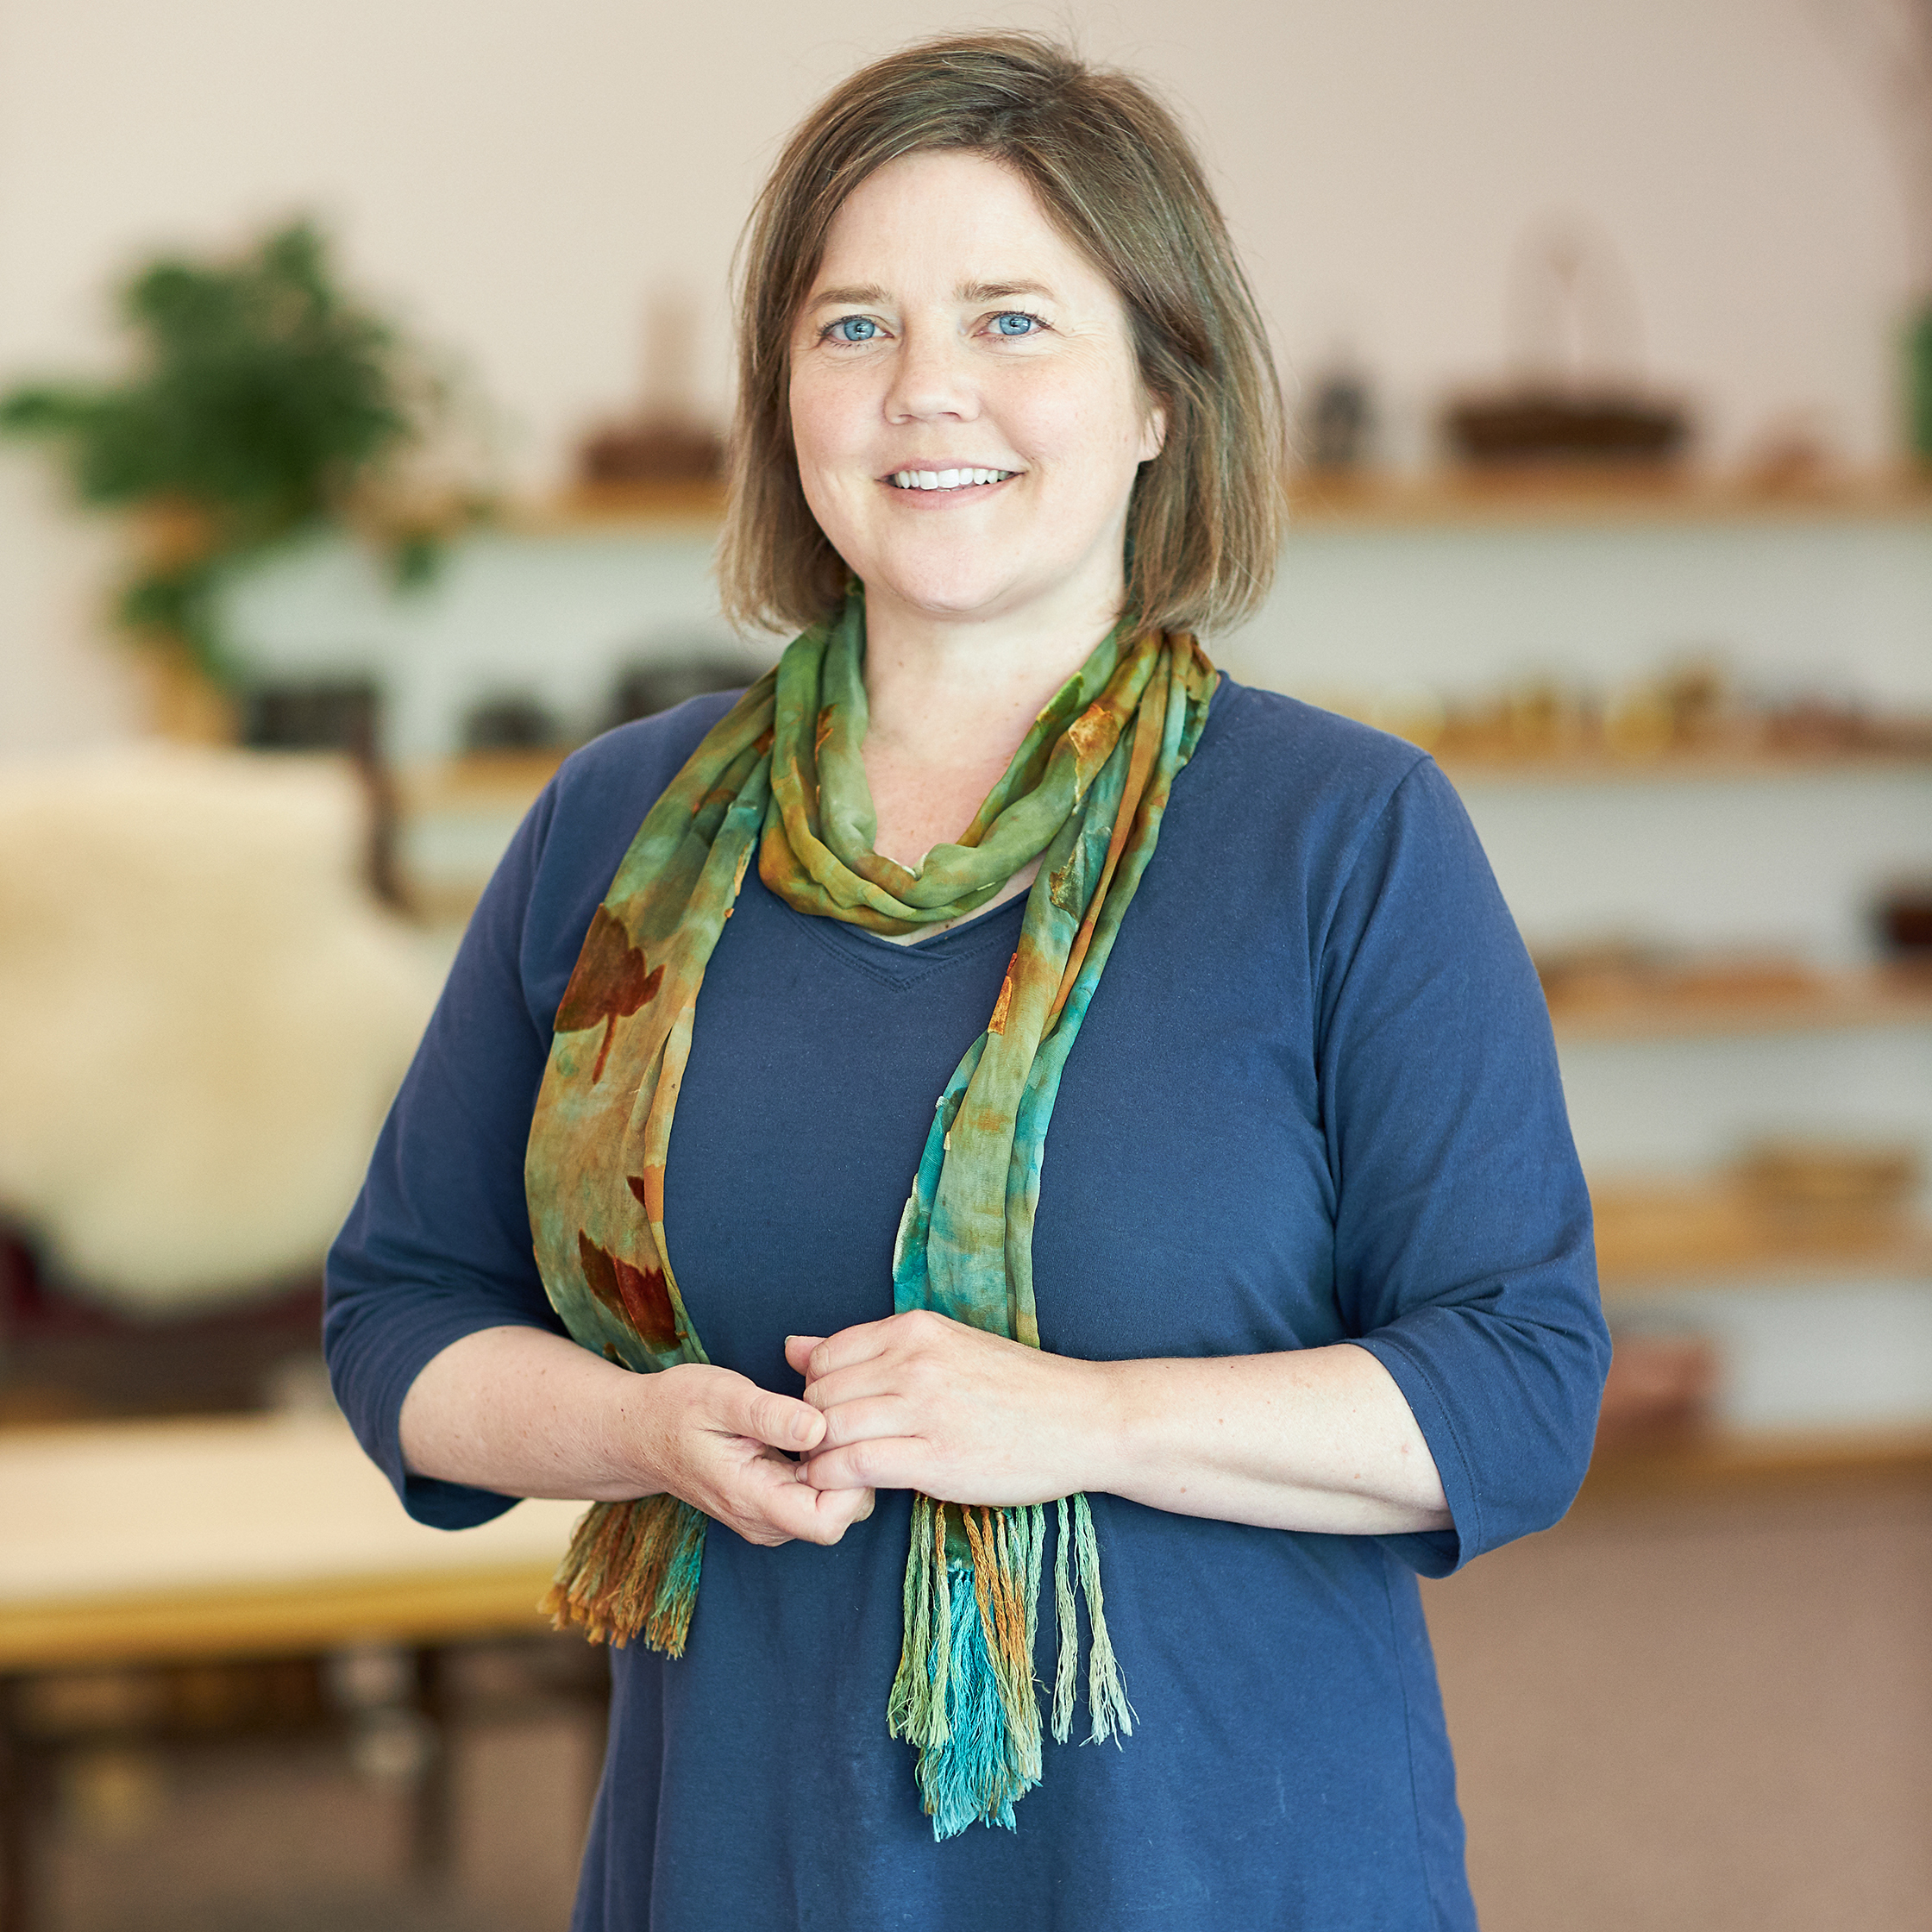 A conversation with Calgary Waldorf School Early Childhood teacher Karen Fjestad